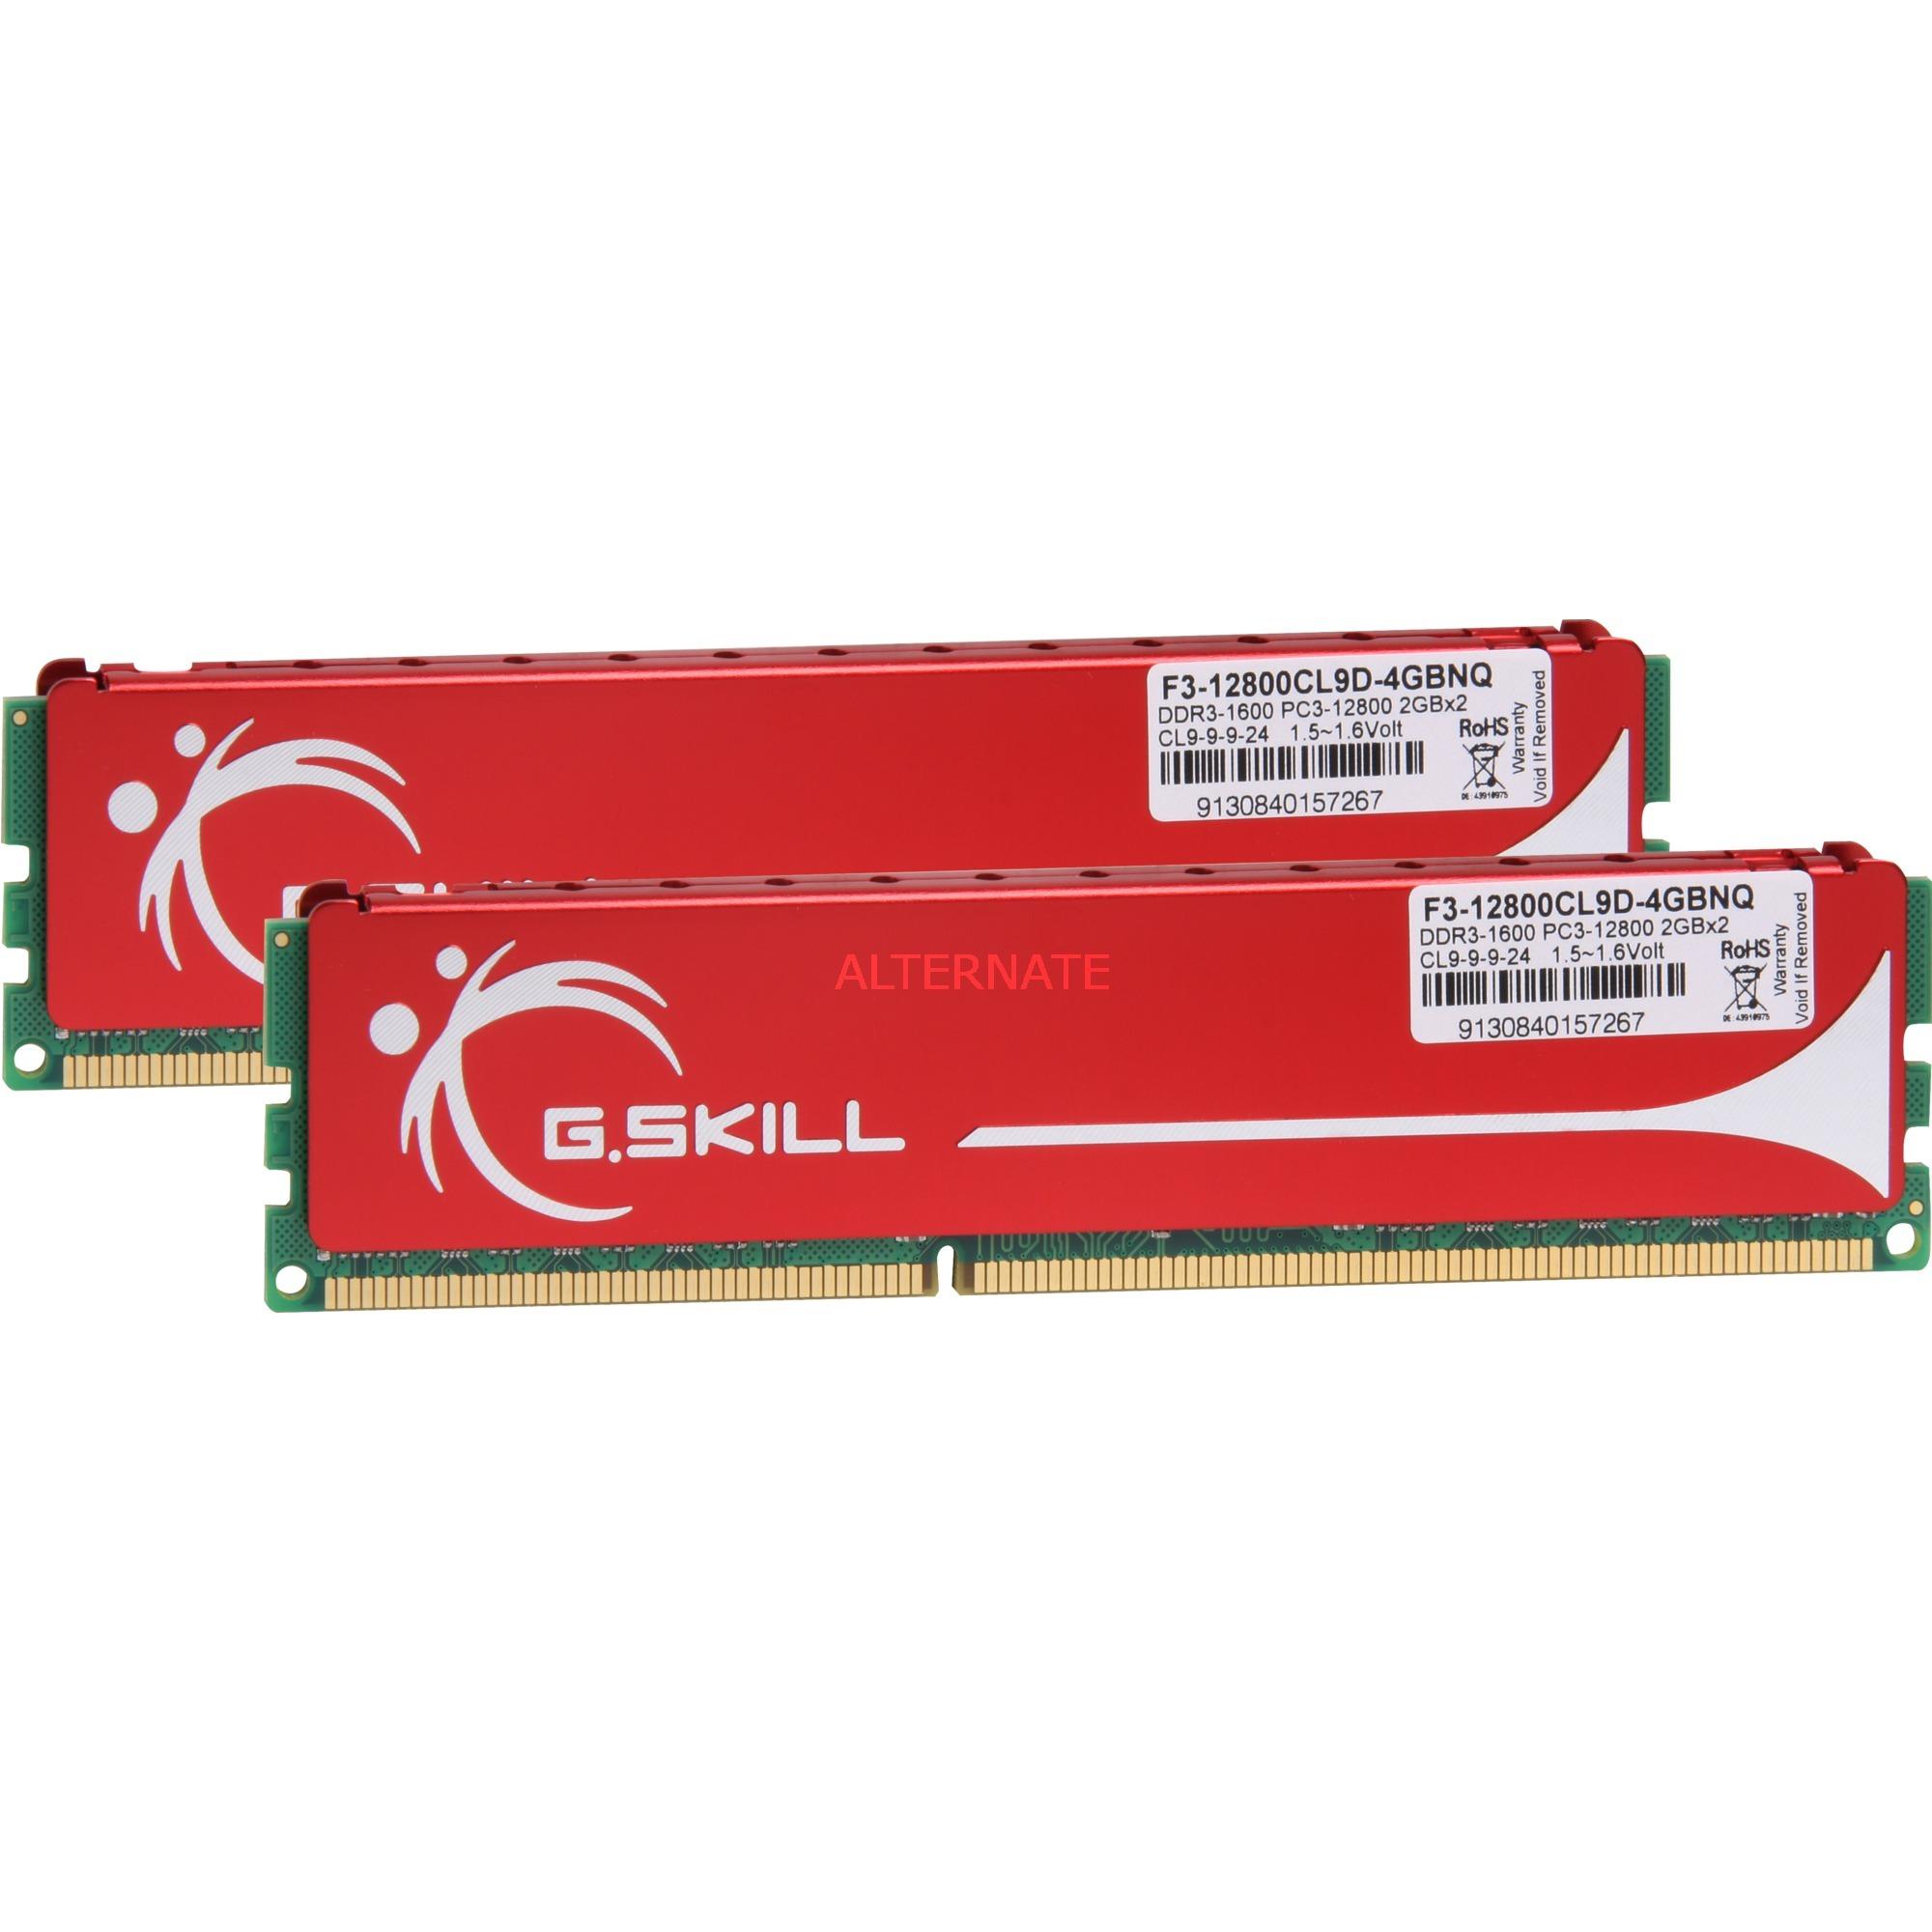 4GB DDR3 PC-12800 CL9 4GB DDR3 1600MHz módulo de memoria, Memoria RAM